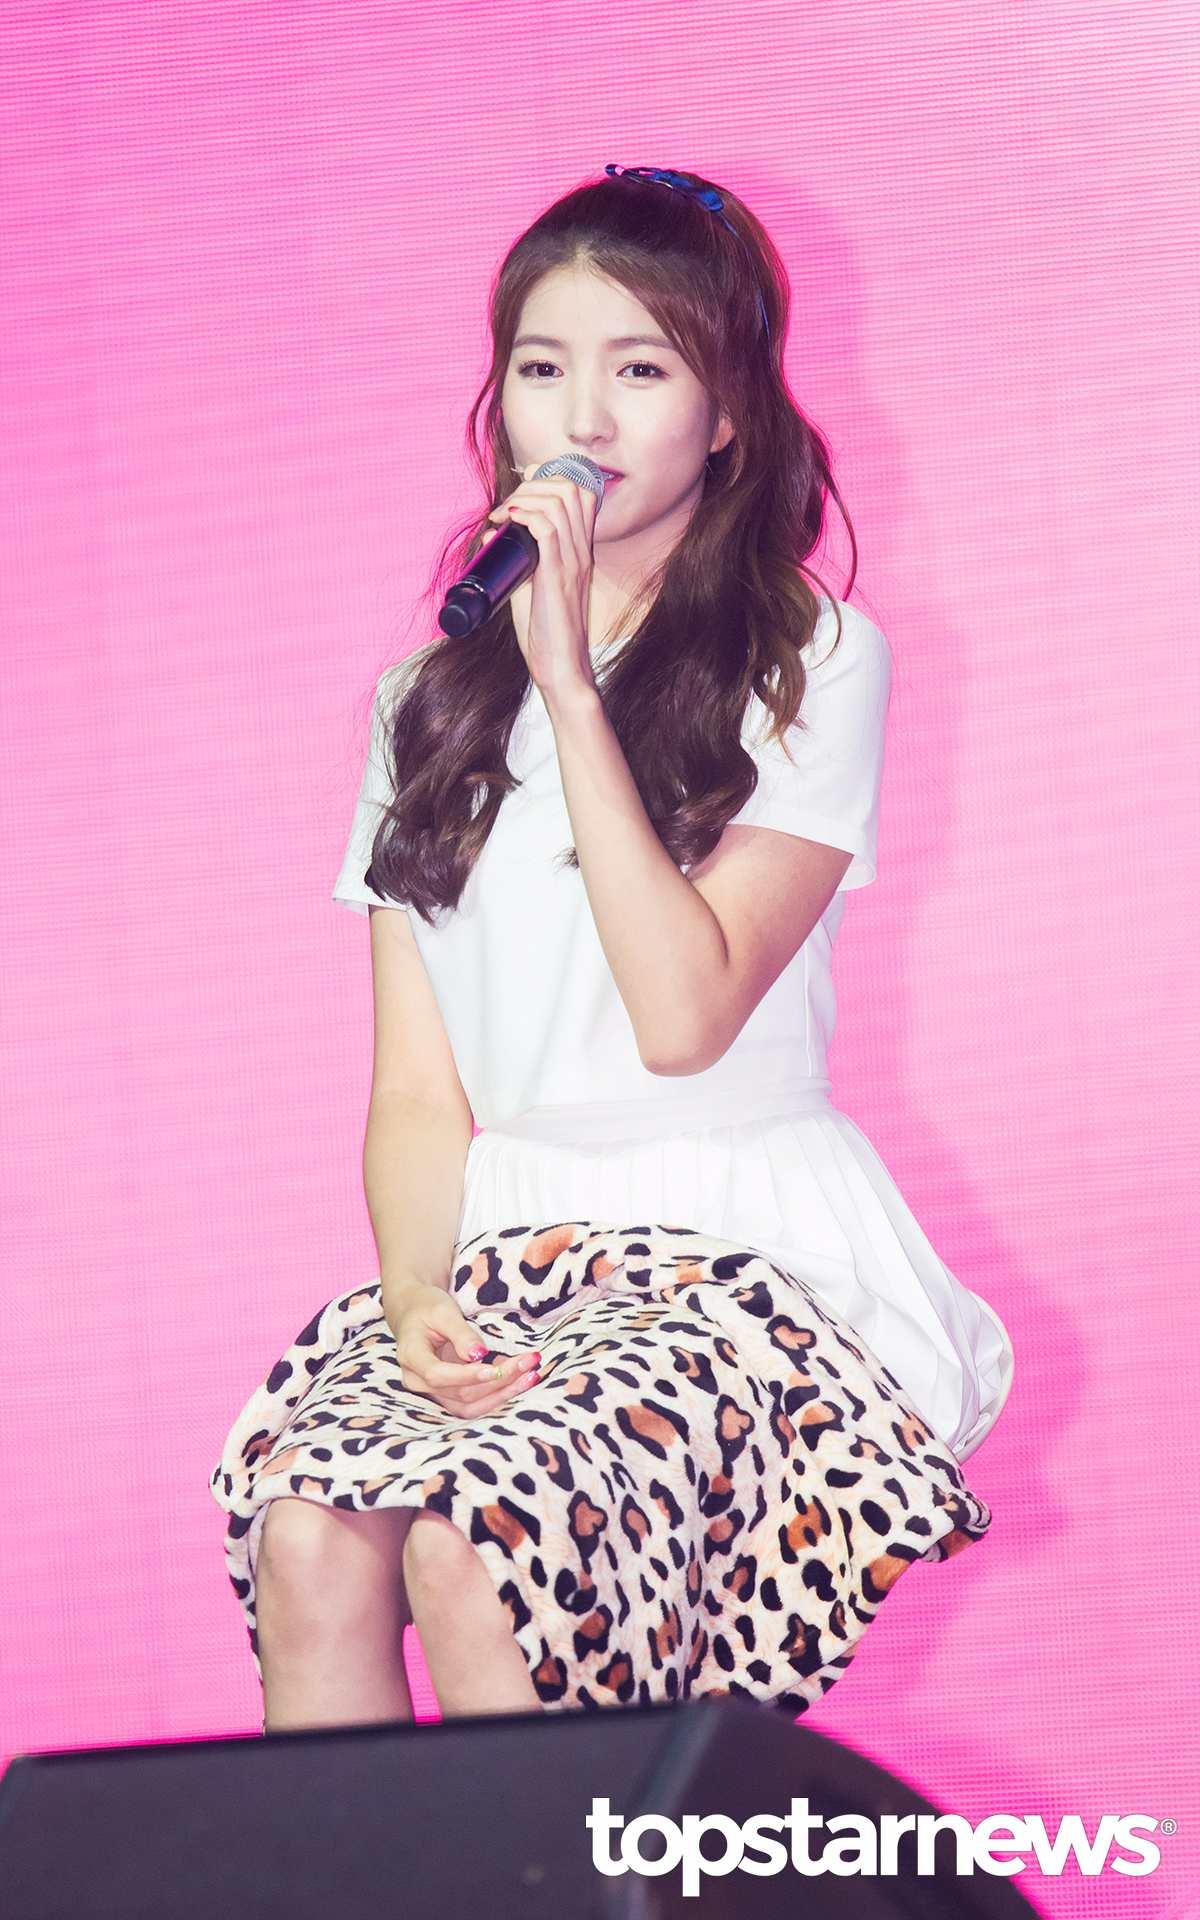 Sowon還說「像神話前輩看齊,希望可以和成員們一起長久的做音樂。」,希望小女友好還可以更好~Fighting!!!